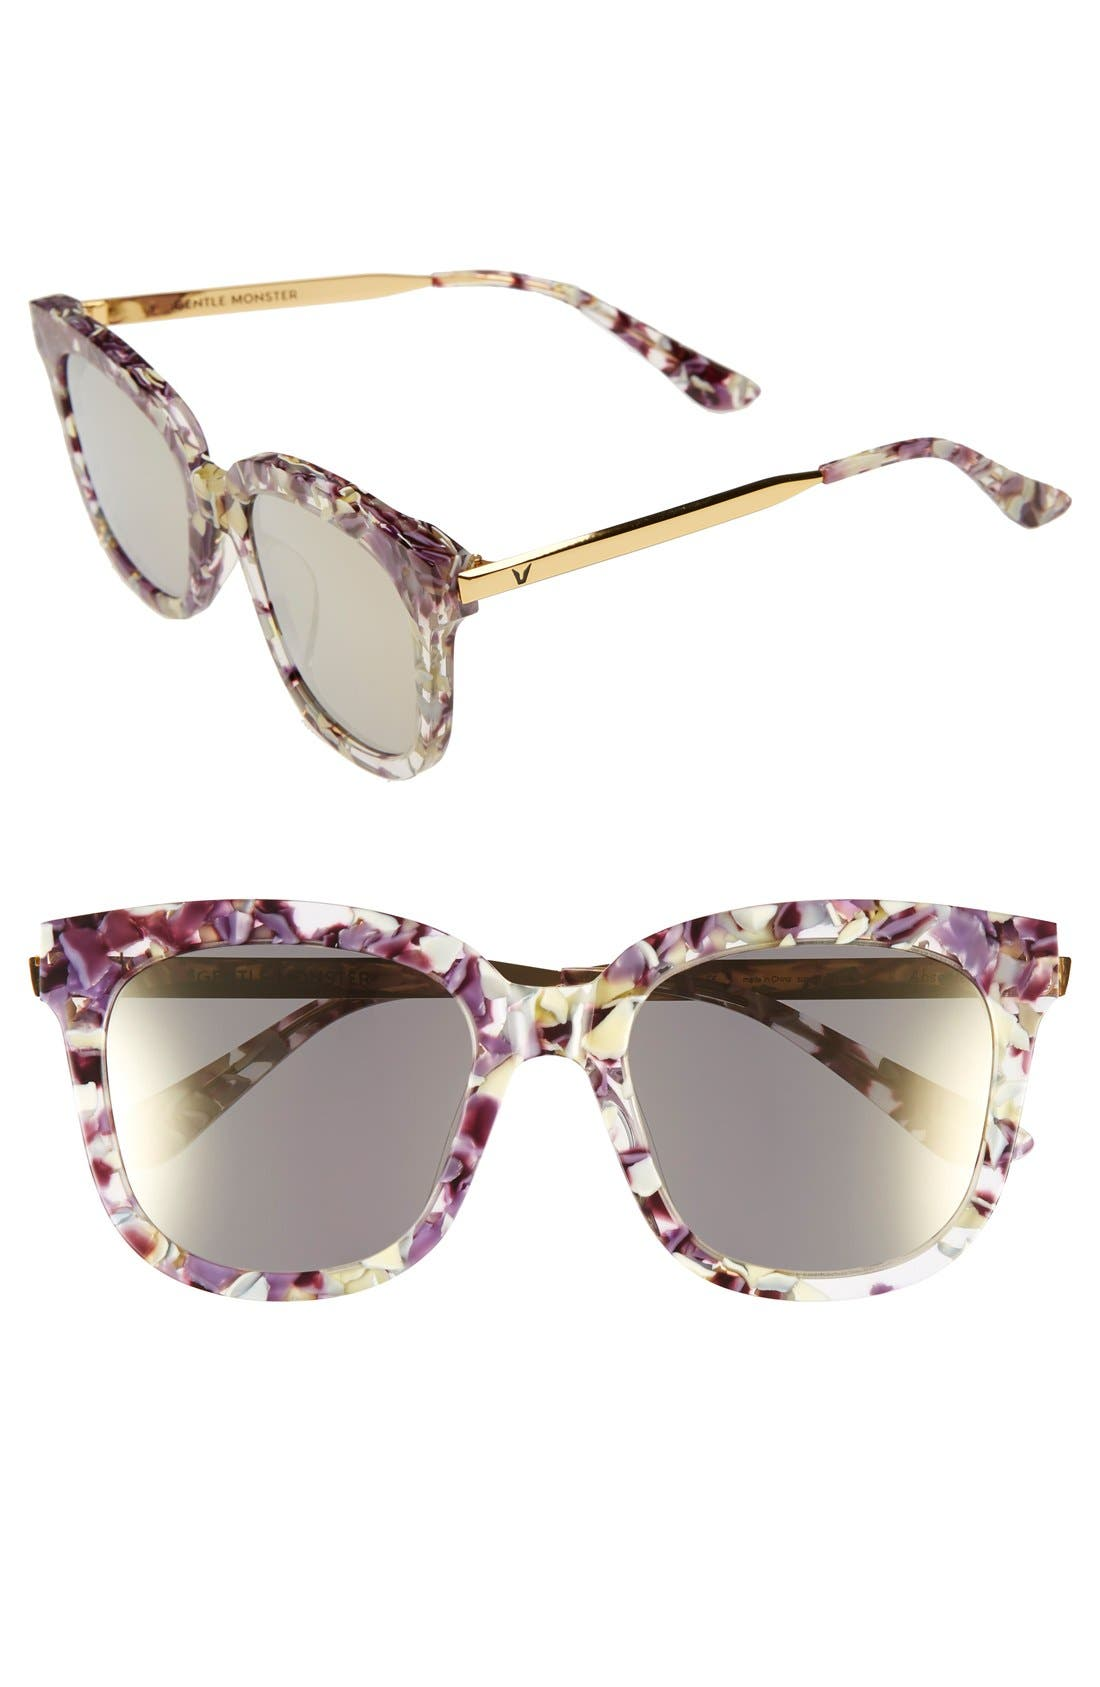 54mm Sunglasses,                             Main thumbnail 1, color,                             Light Purple/ Clear